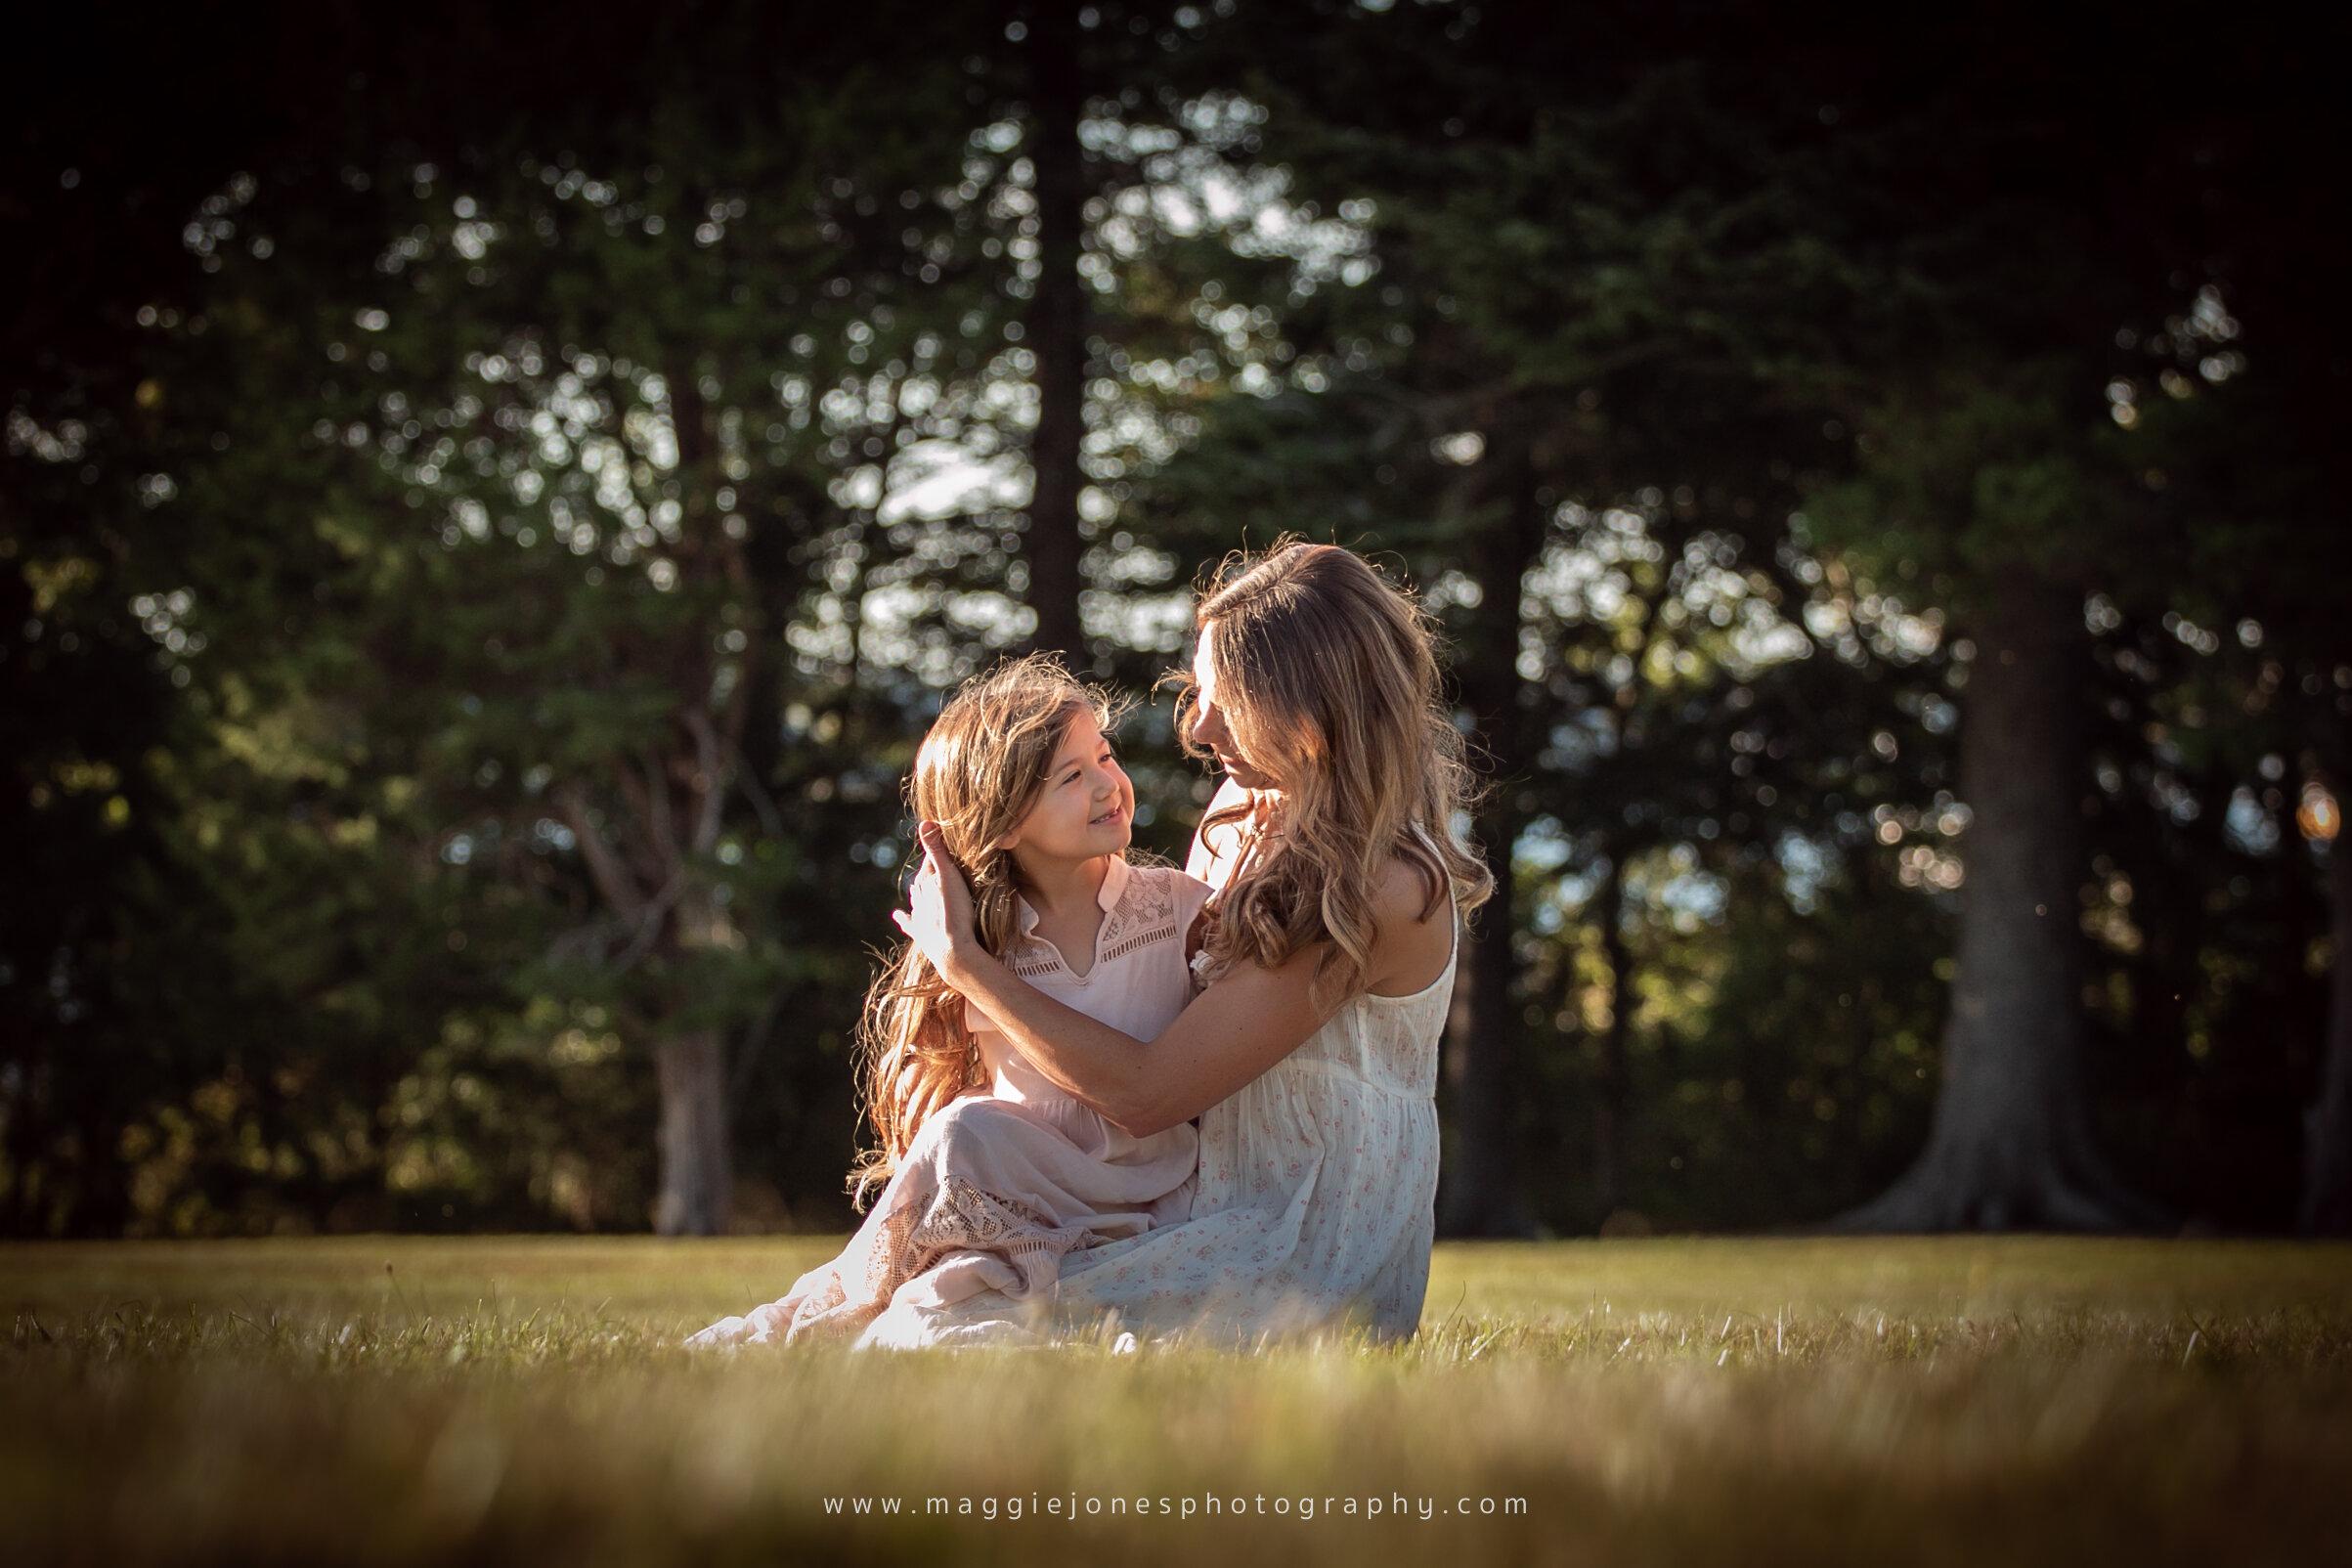 Lauren+Summer_BLOG-1-4.jpg